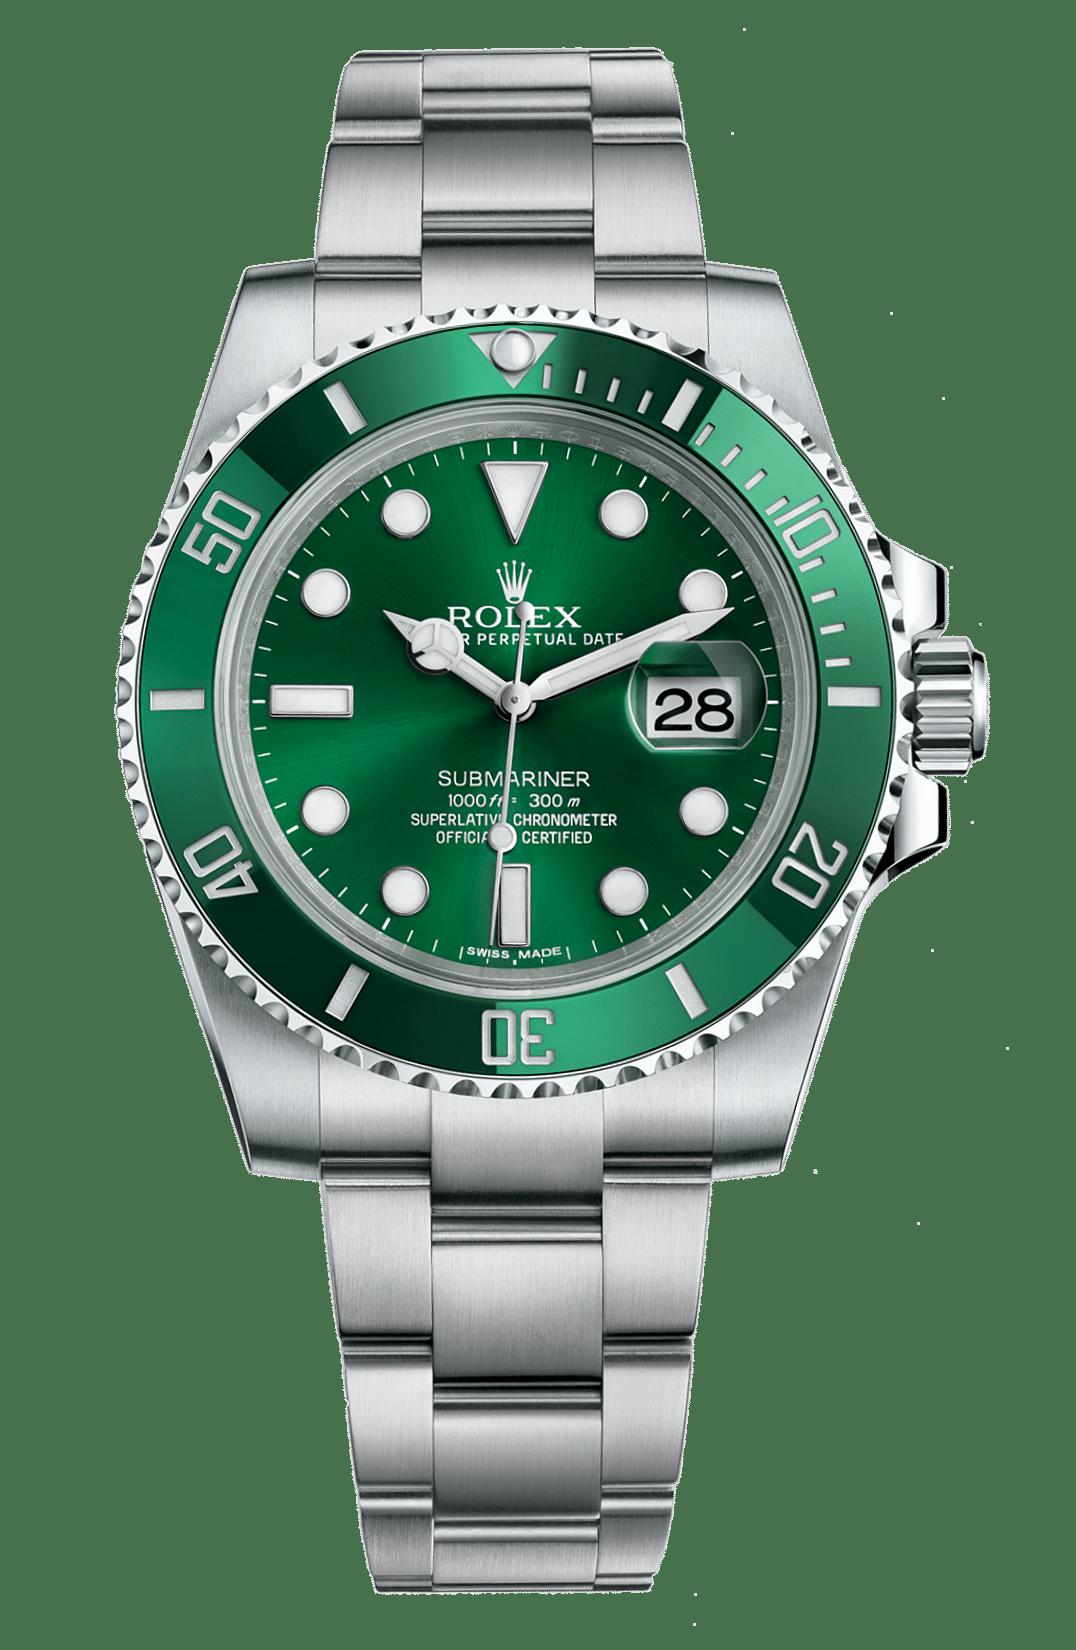 Rolex 116610LV Hulk Submariner Date 40 mm